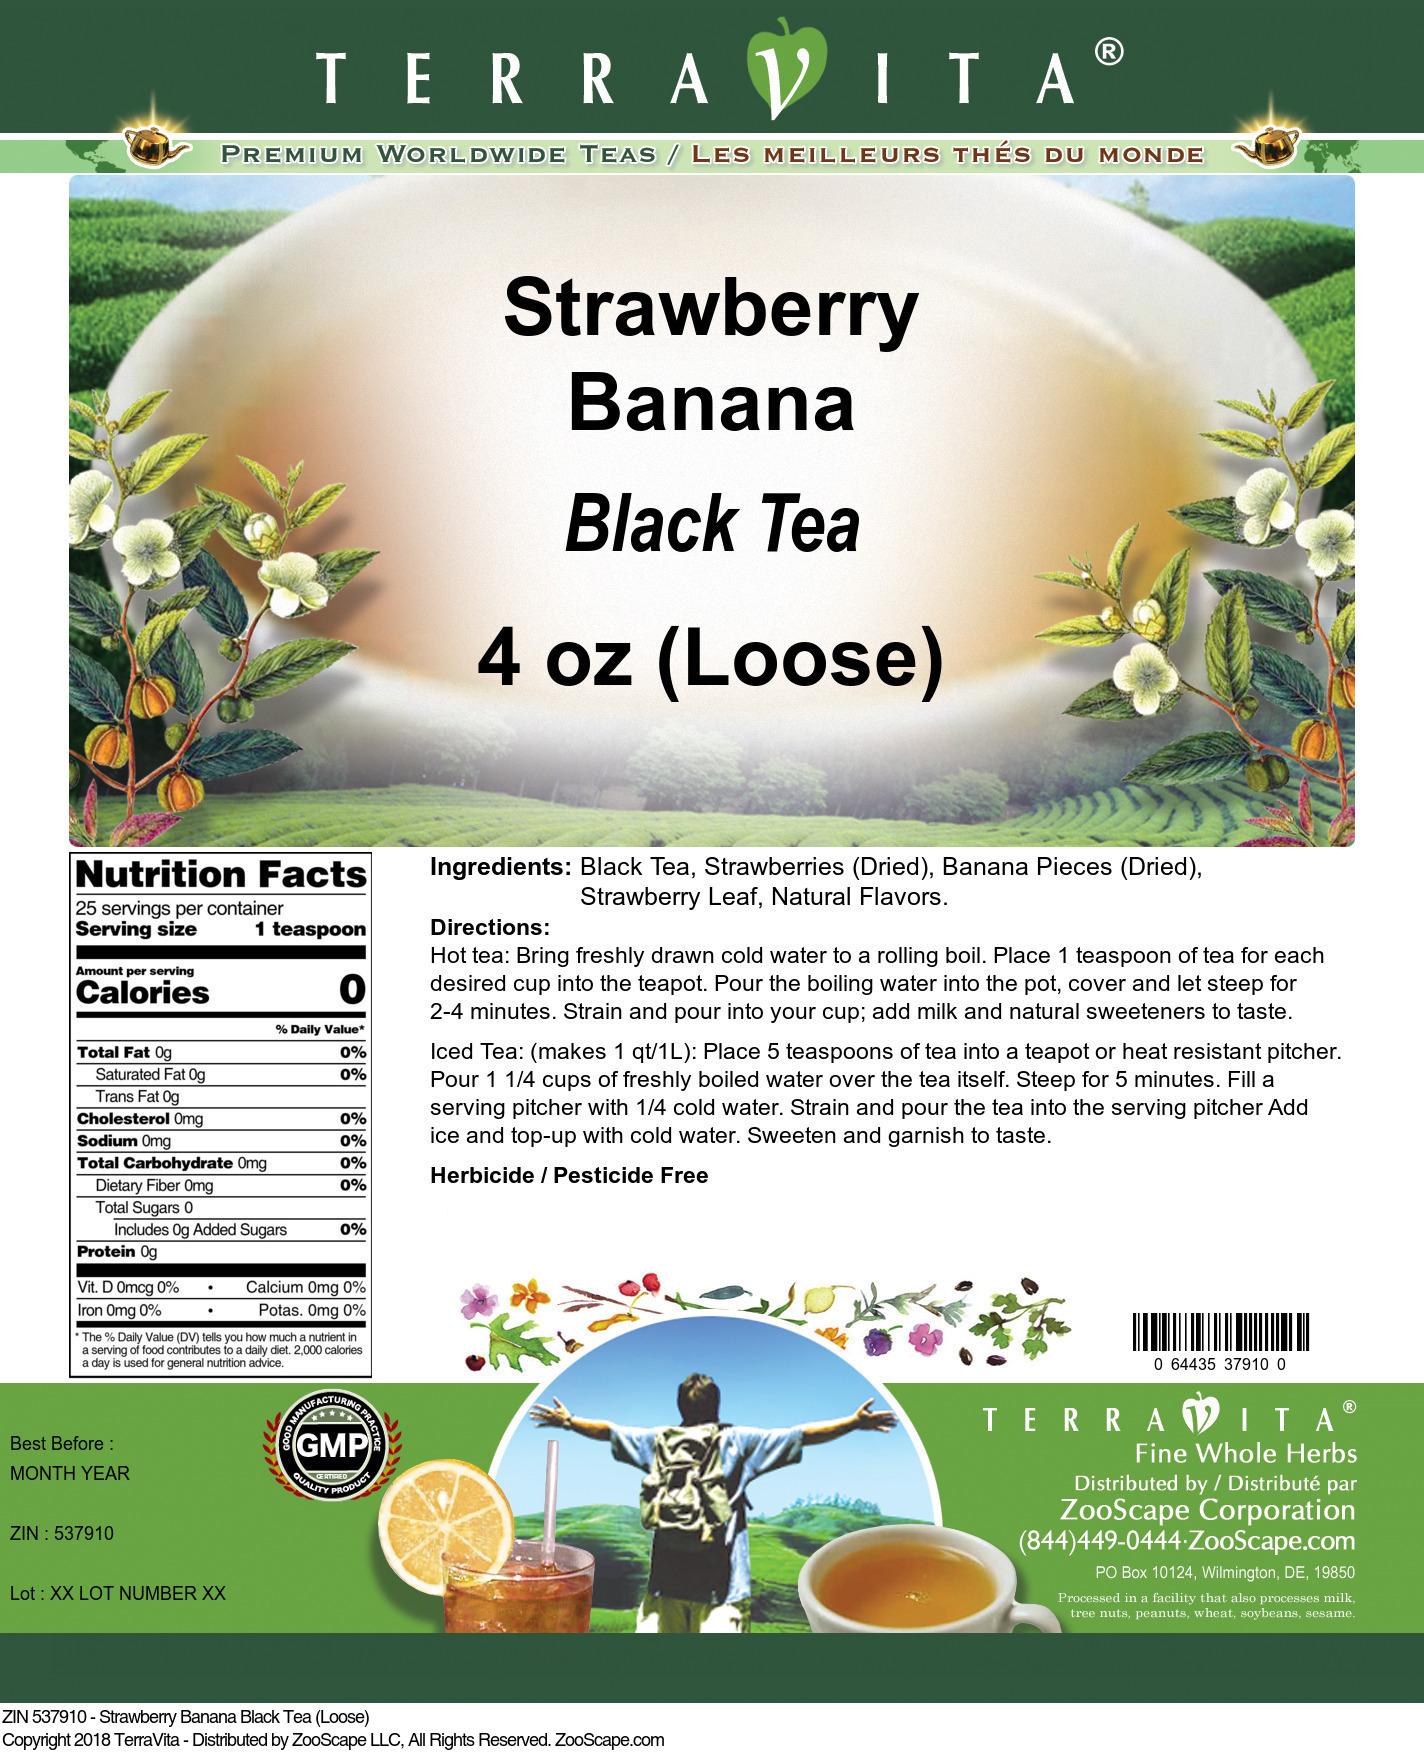 Strawberry Banana Black Tea